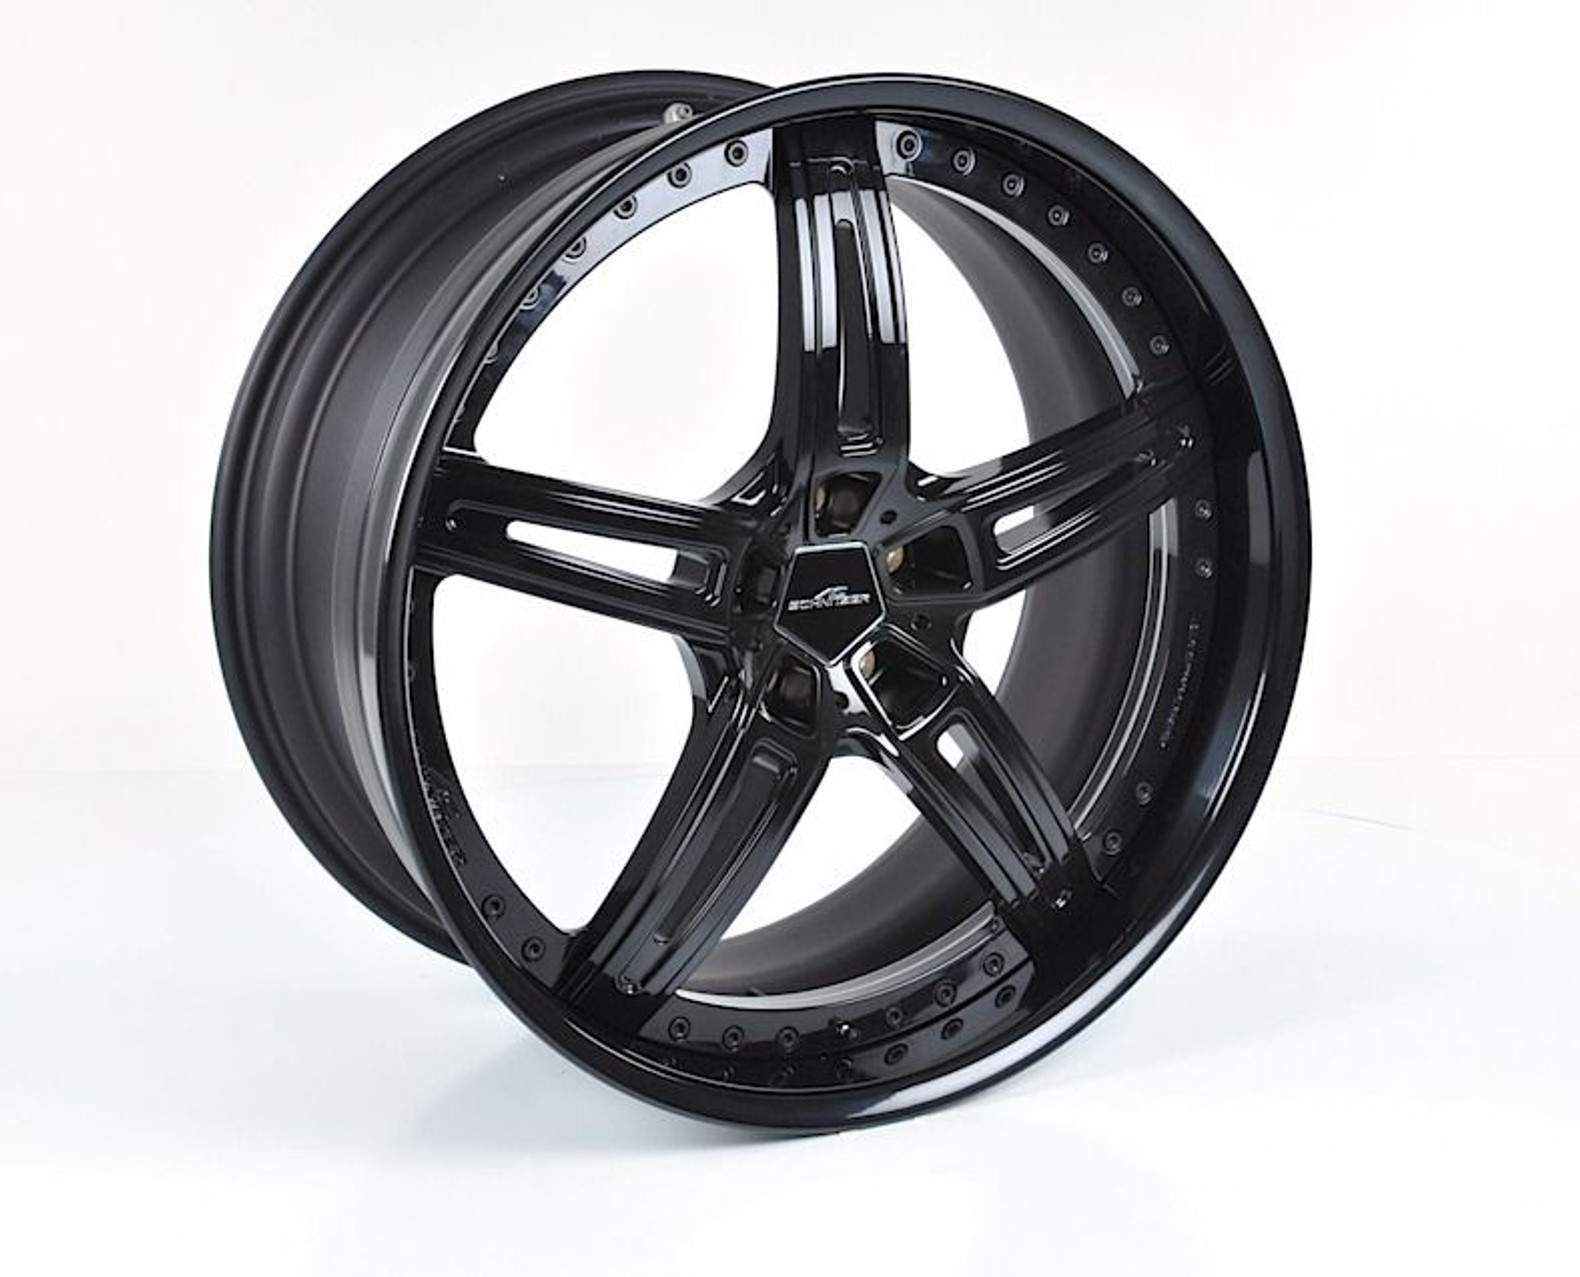 Ac Schnitzer Ac1 Multipiece 22 Black Alloy Wheel Sets For Bmw X5 F15 Performance M Bmw Mini Performance Parts Specialists